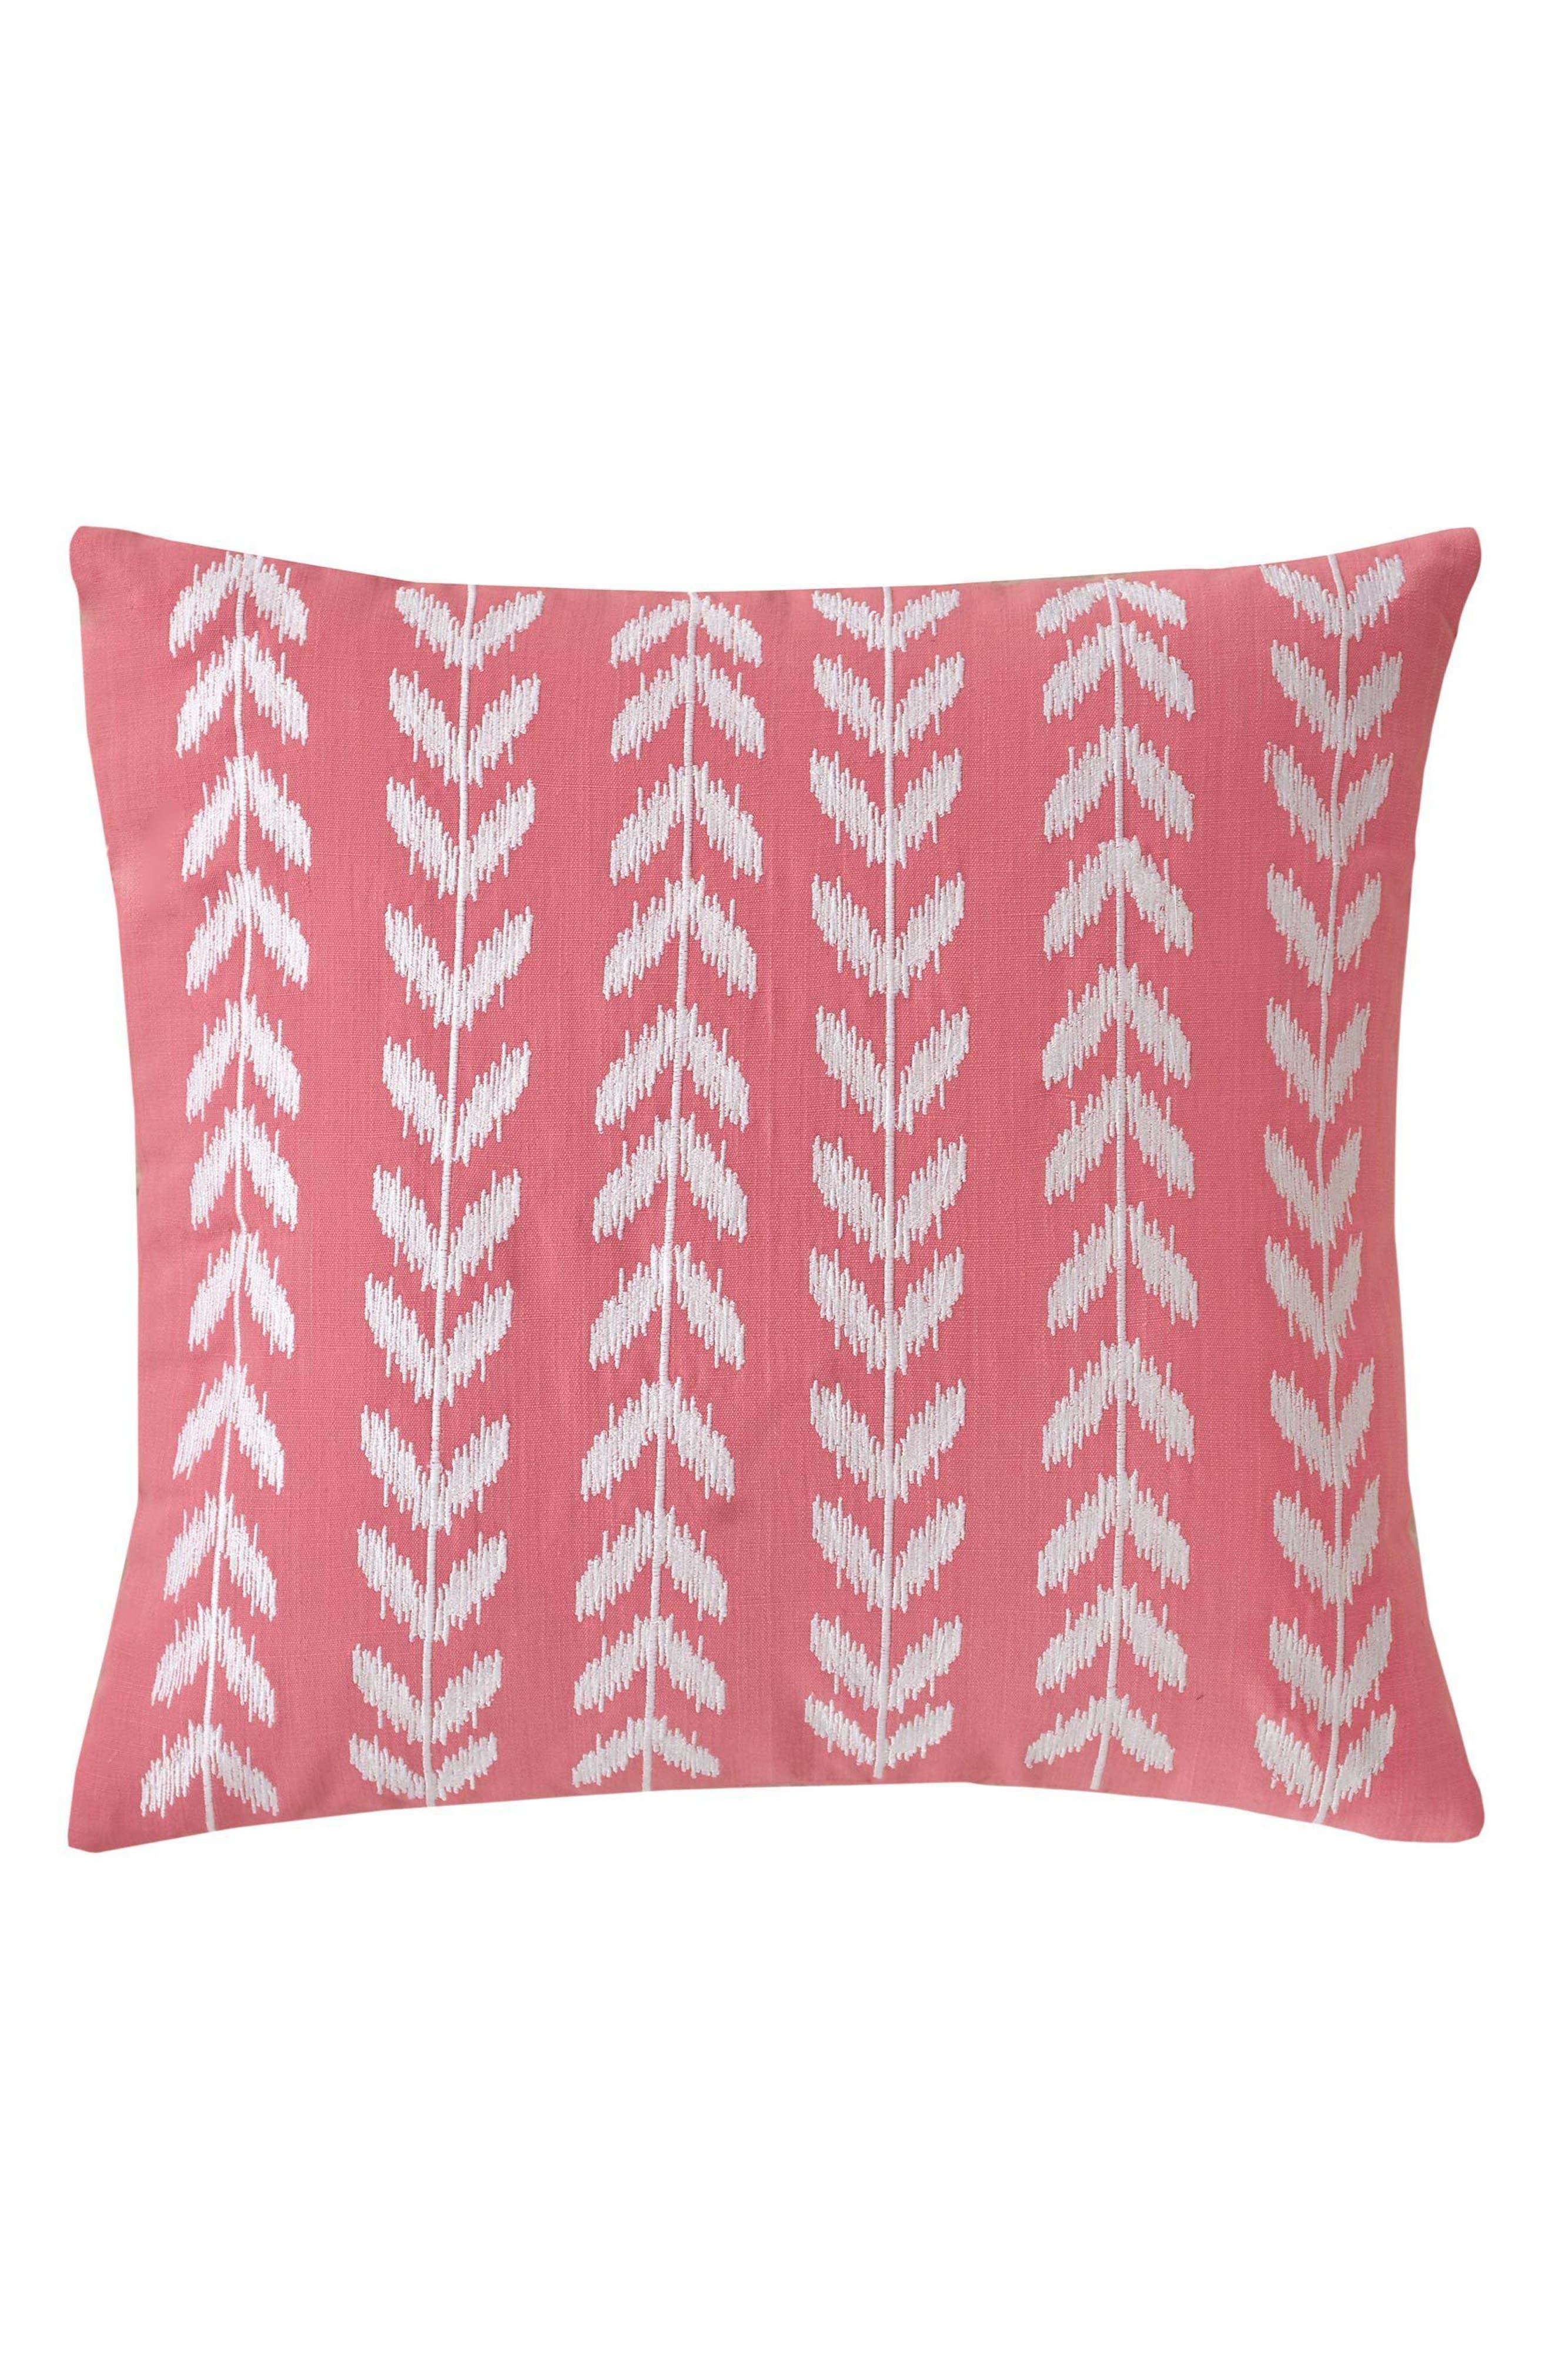 Coastal Ikat Heart Deco Accent Pillow,                             Main thumbnail 1, color,                             SUGAR CORAL